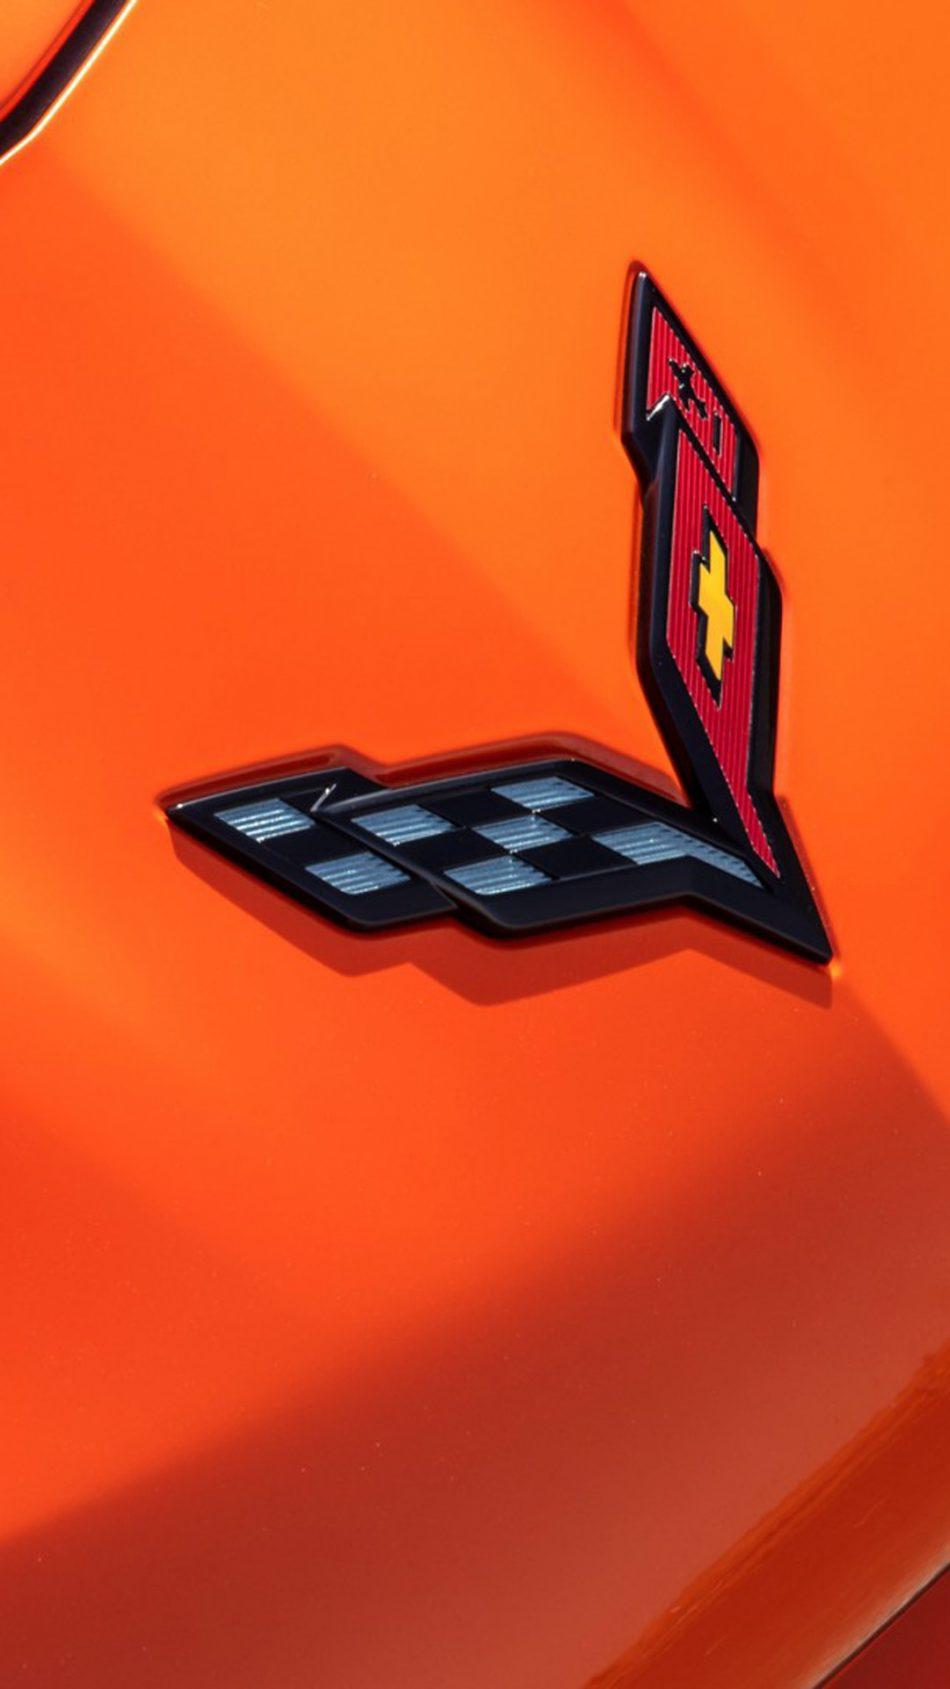 Download Chevrolet Corvette Logo Free Pure 4k Ultra Hd Mobile Wallpaper